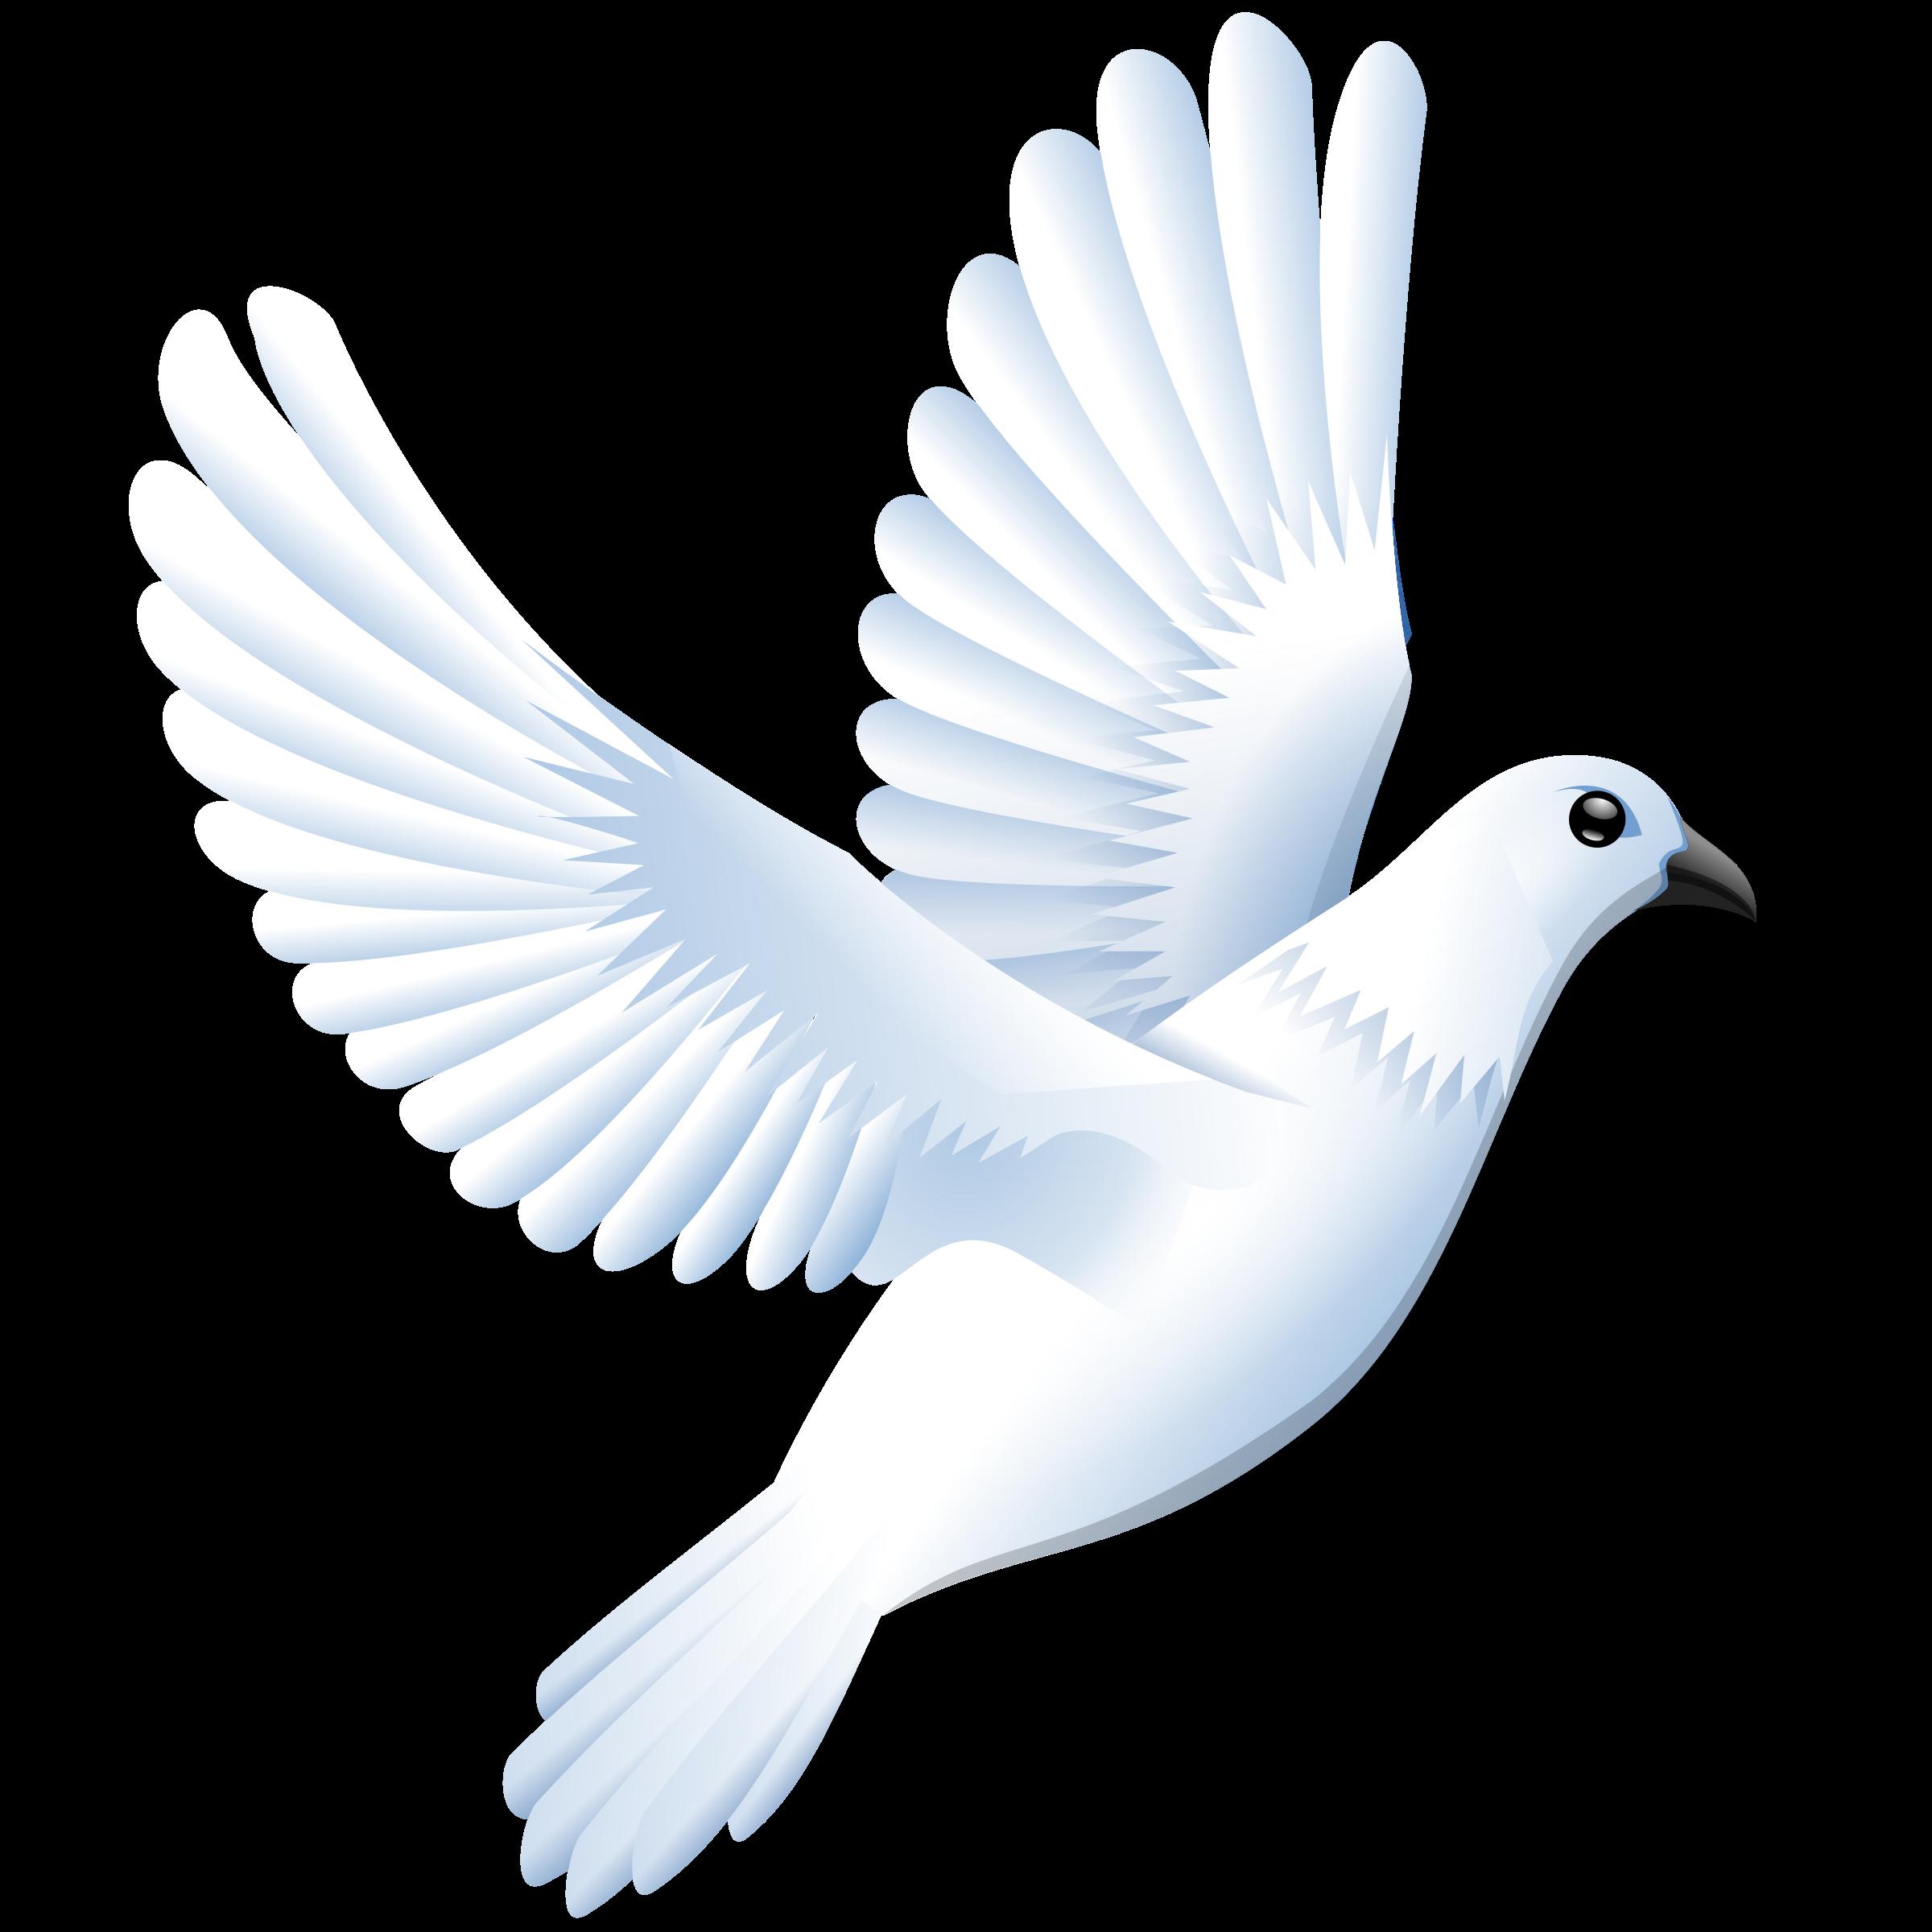 Peace clipart wing PEACE Clipart PEACE